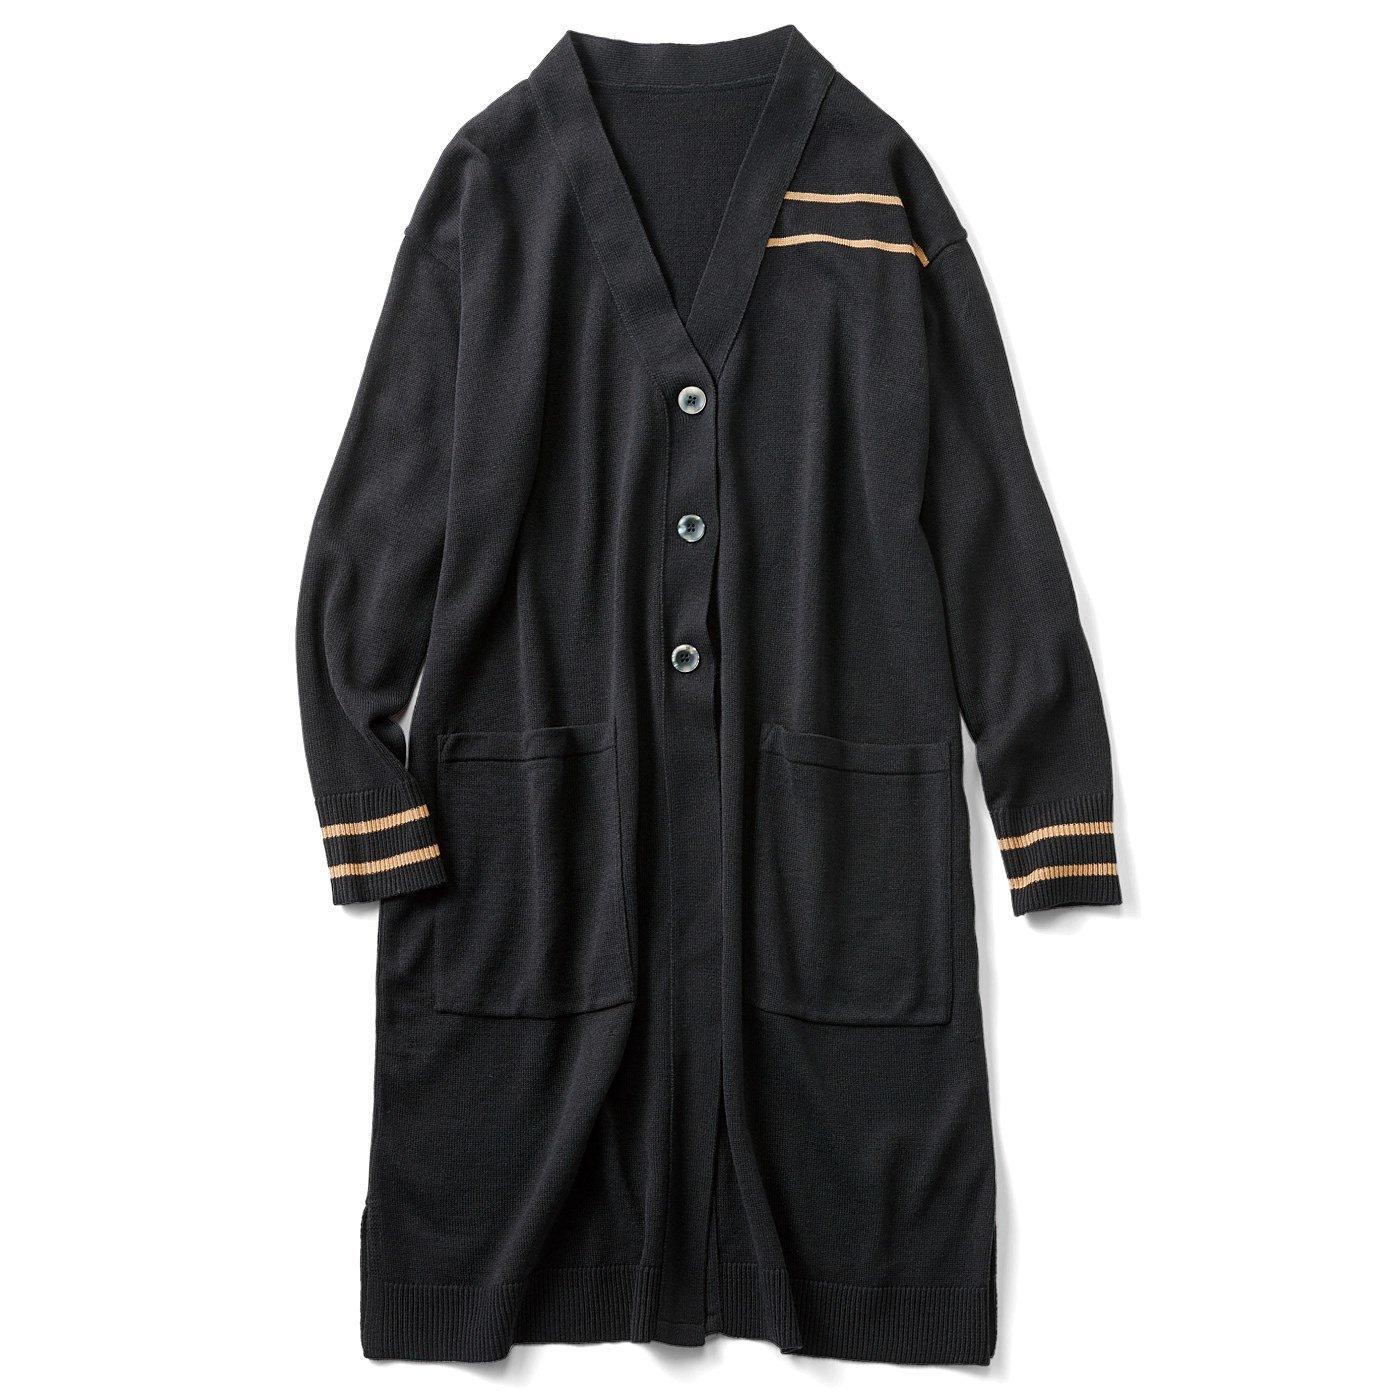 HIROMI YOSHIDA. ウール混のラインニットロングカーディガン〈ブラック〉